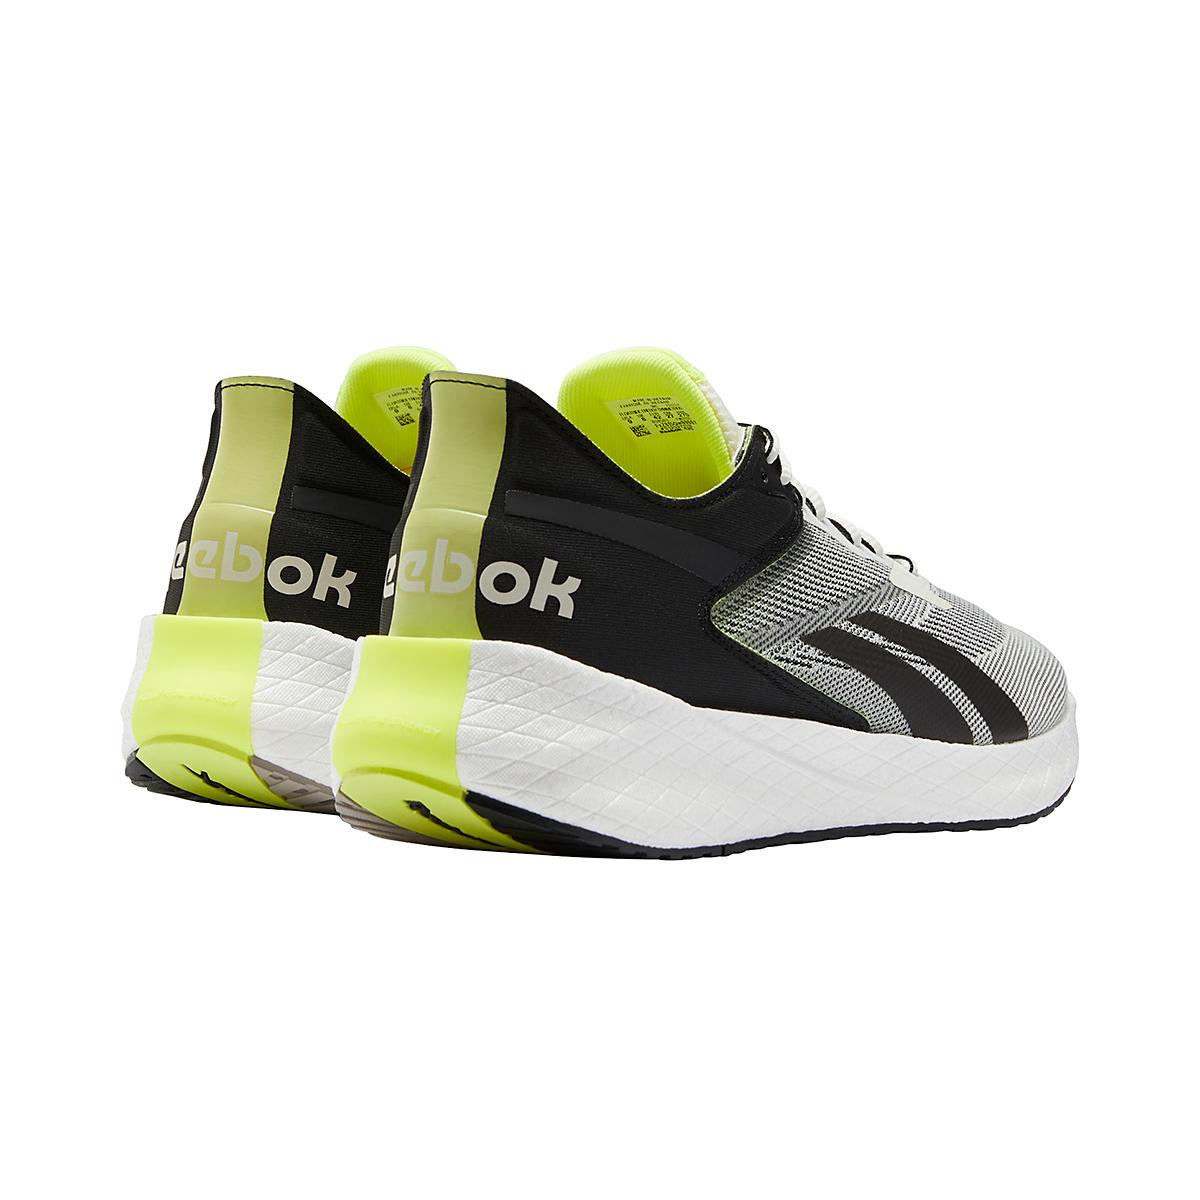 Men's Reebok Floatride Energy Symmetros Running Shoe - Color: Classic White/Core Black/Yellow Flare - Size: 7 - Width: Regular, Classic White/Core Black/Yellow Flare, large, image 5